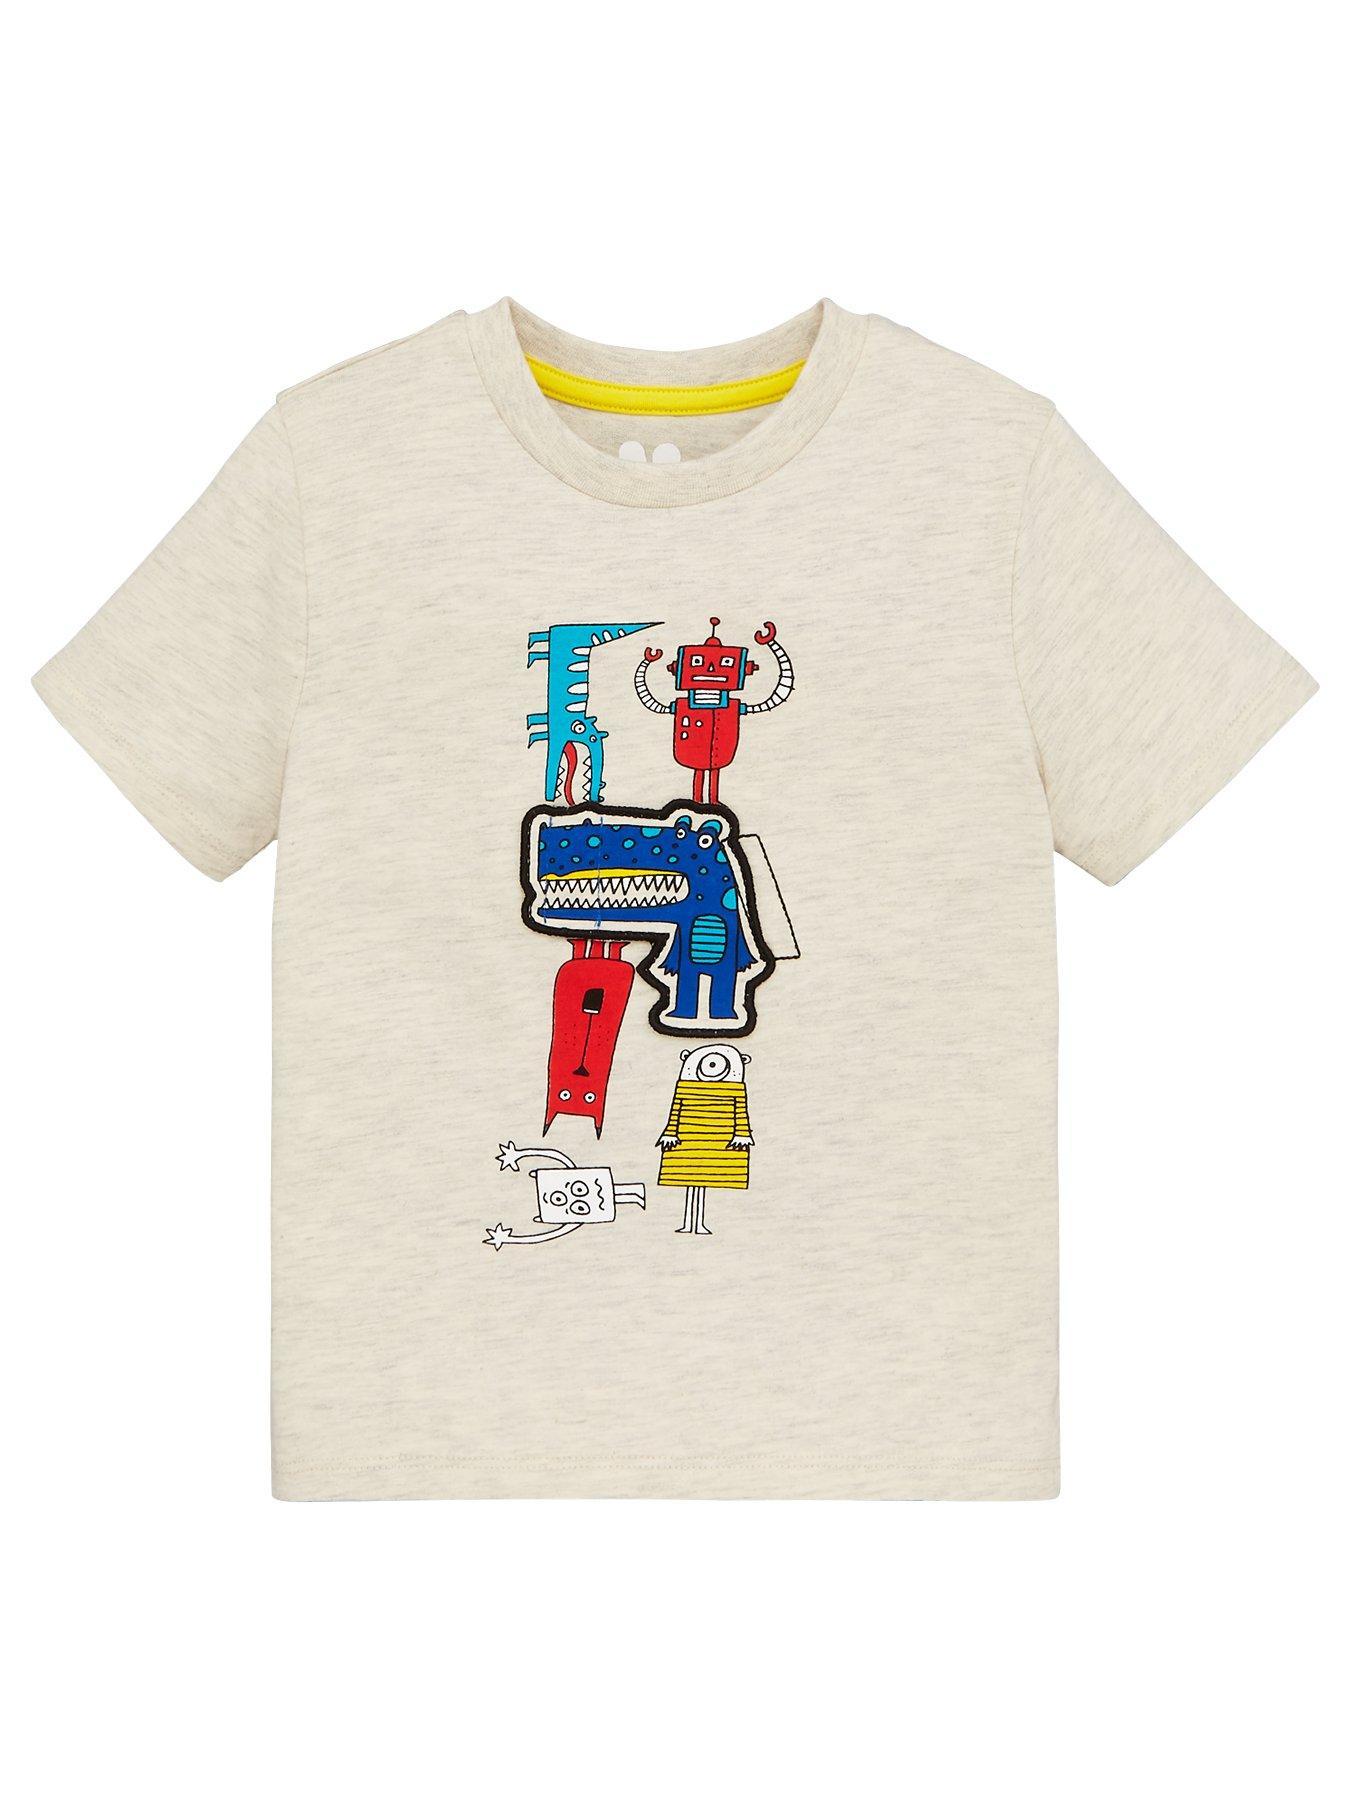 Born Cycle Kids T-Shirt Cycling Cyclist T Shirt School Tshirt Sizes 5-15